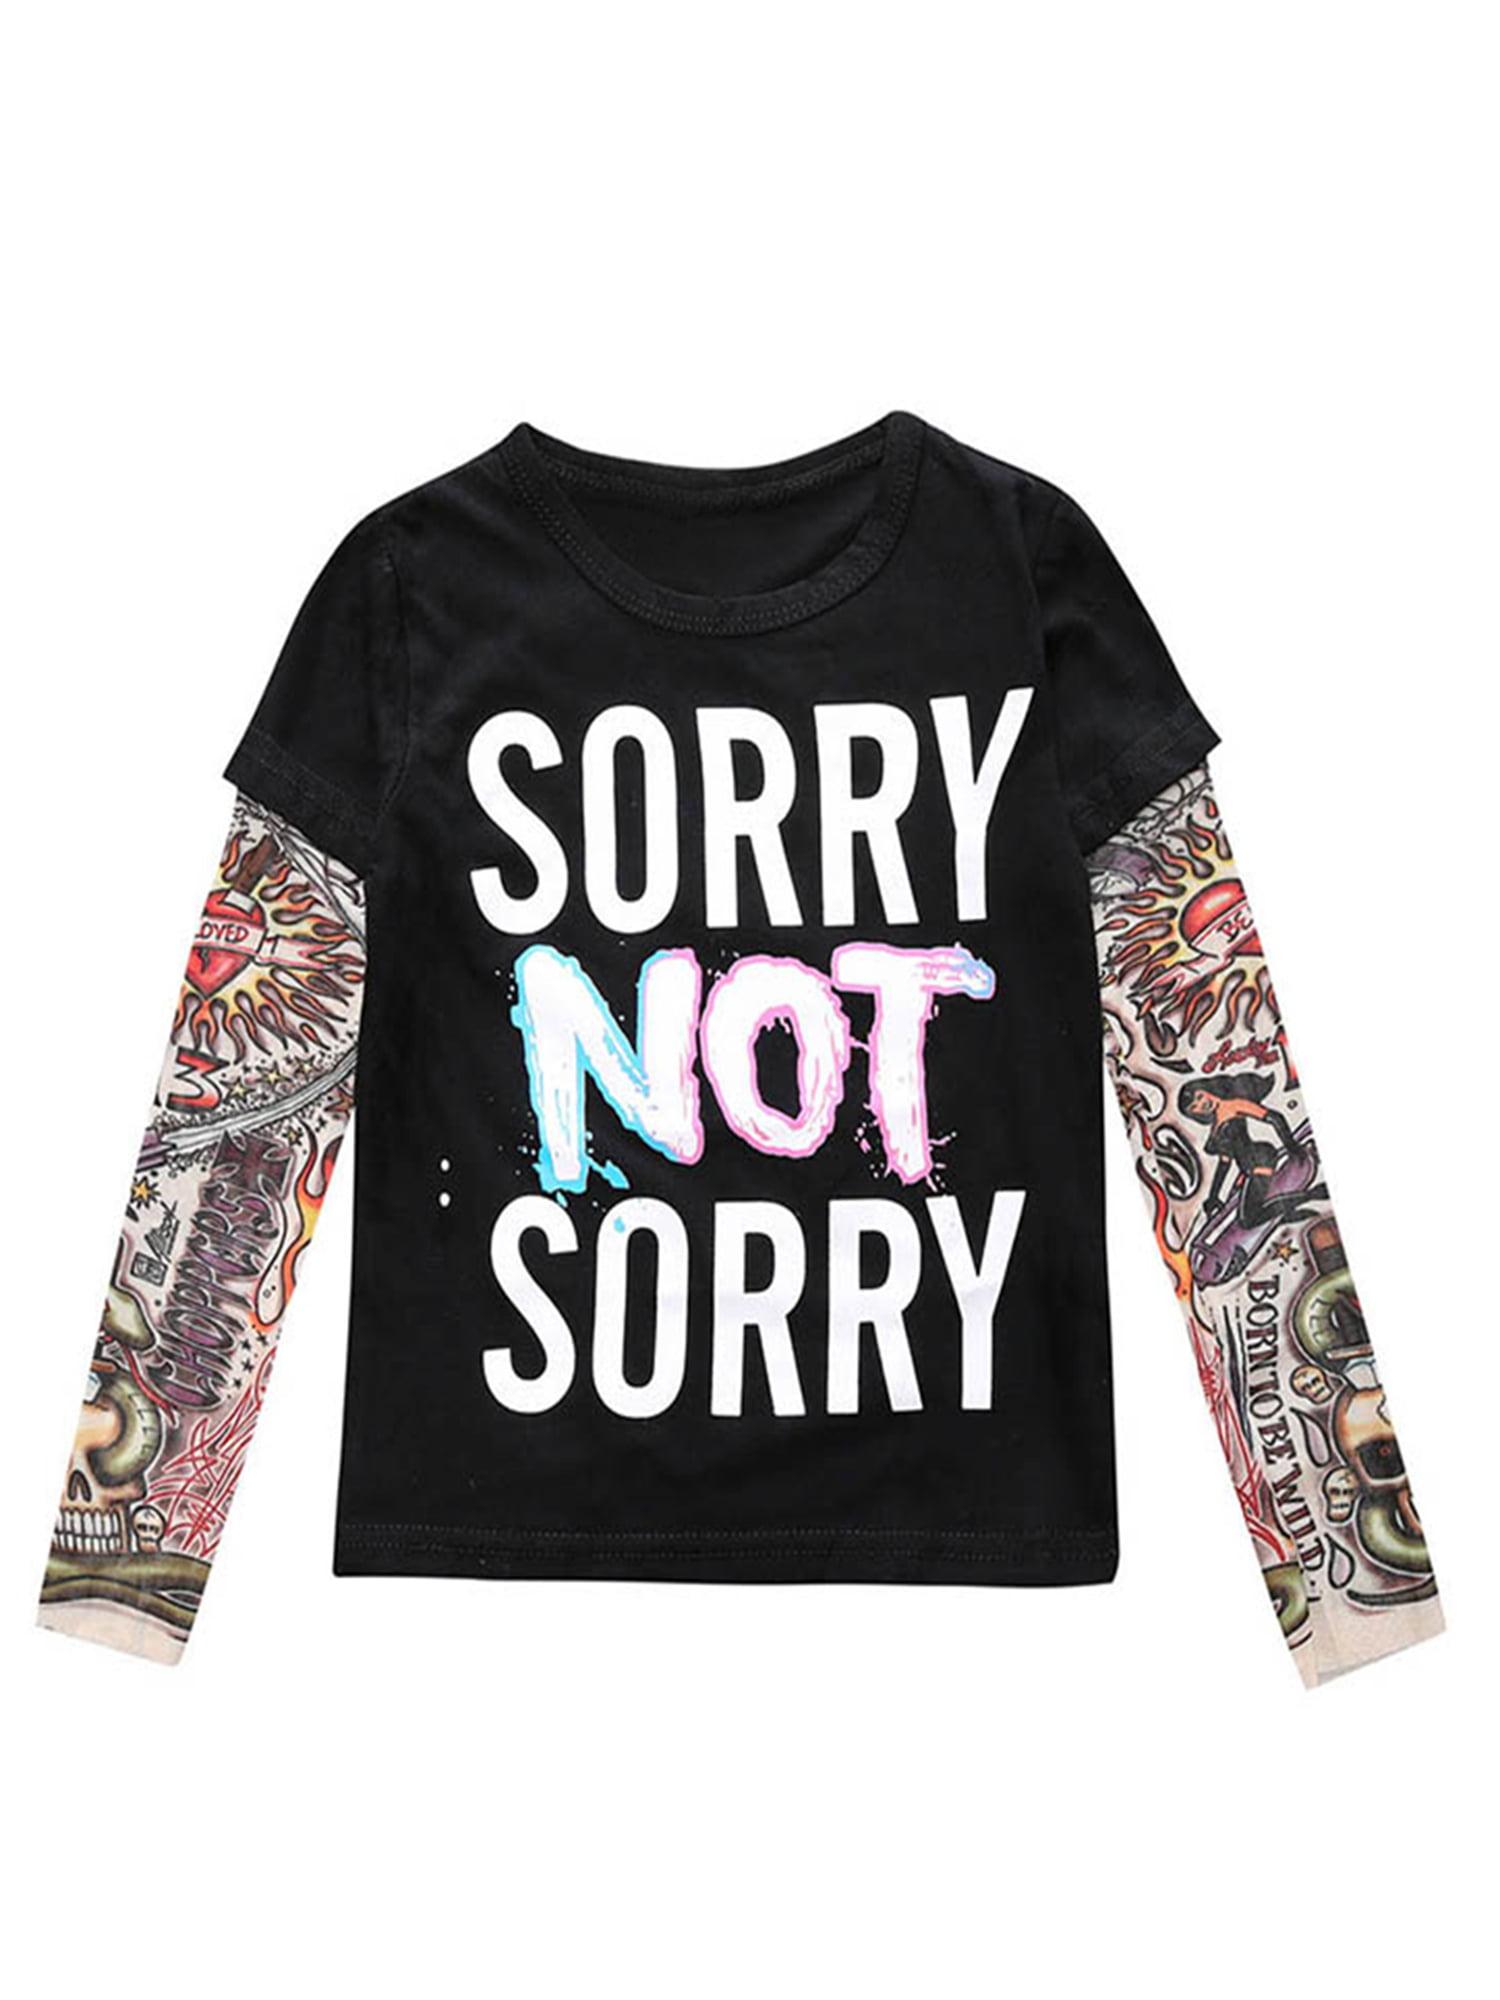 Stylesilove Stylesilove Super Cool Unisex Kid Cotton T Shirt Withk Mesh Tattoo Sleeve 100 3t Sorry Not Sorry Walmart Com Walmart Com